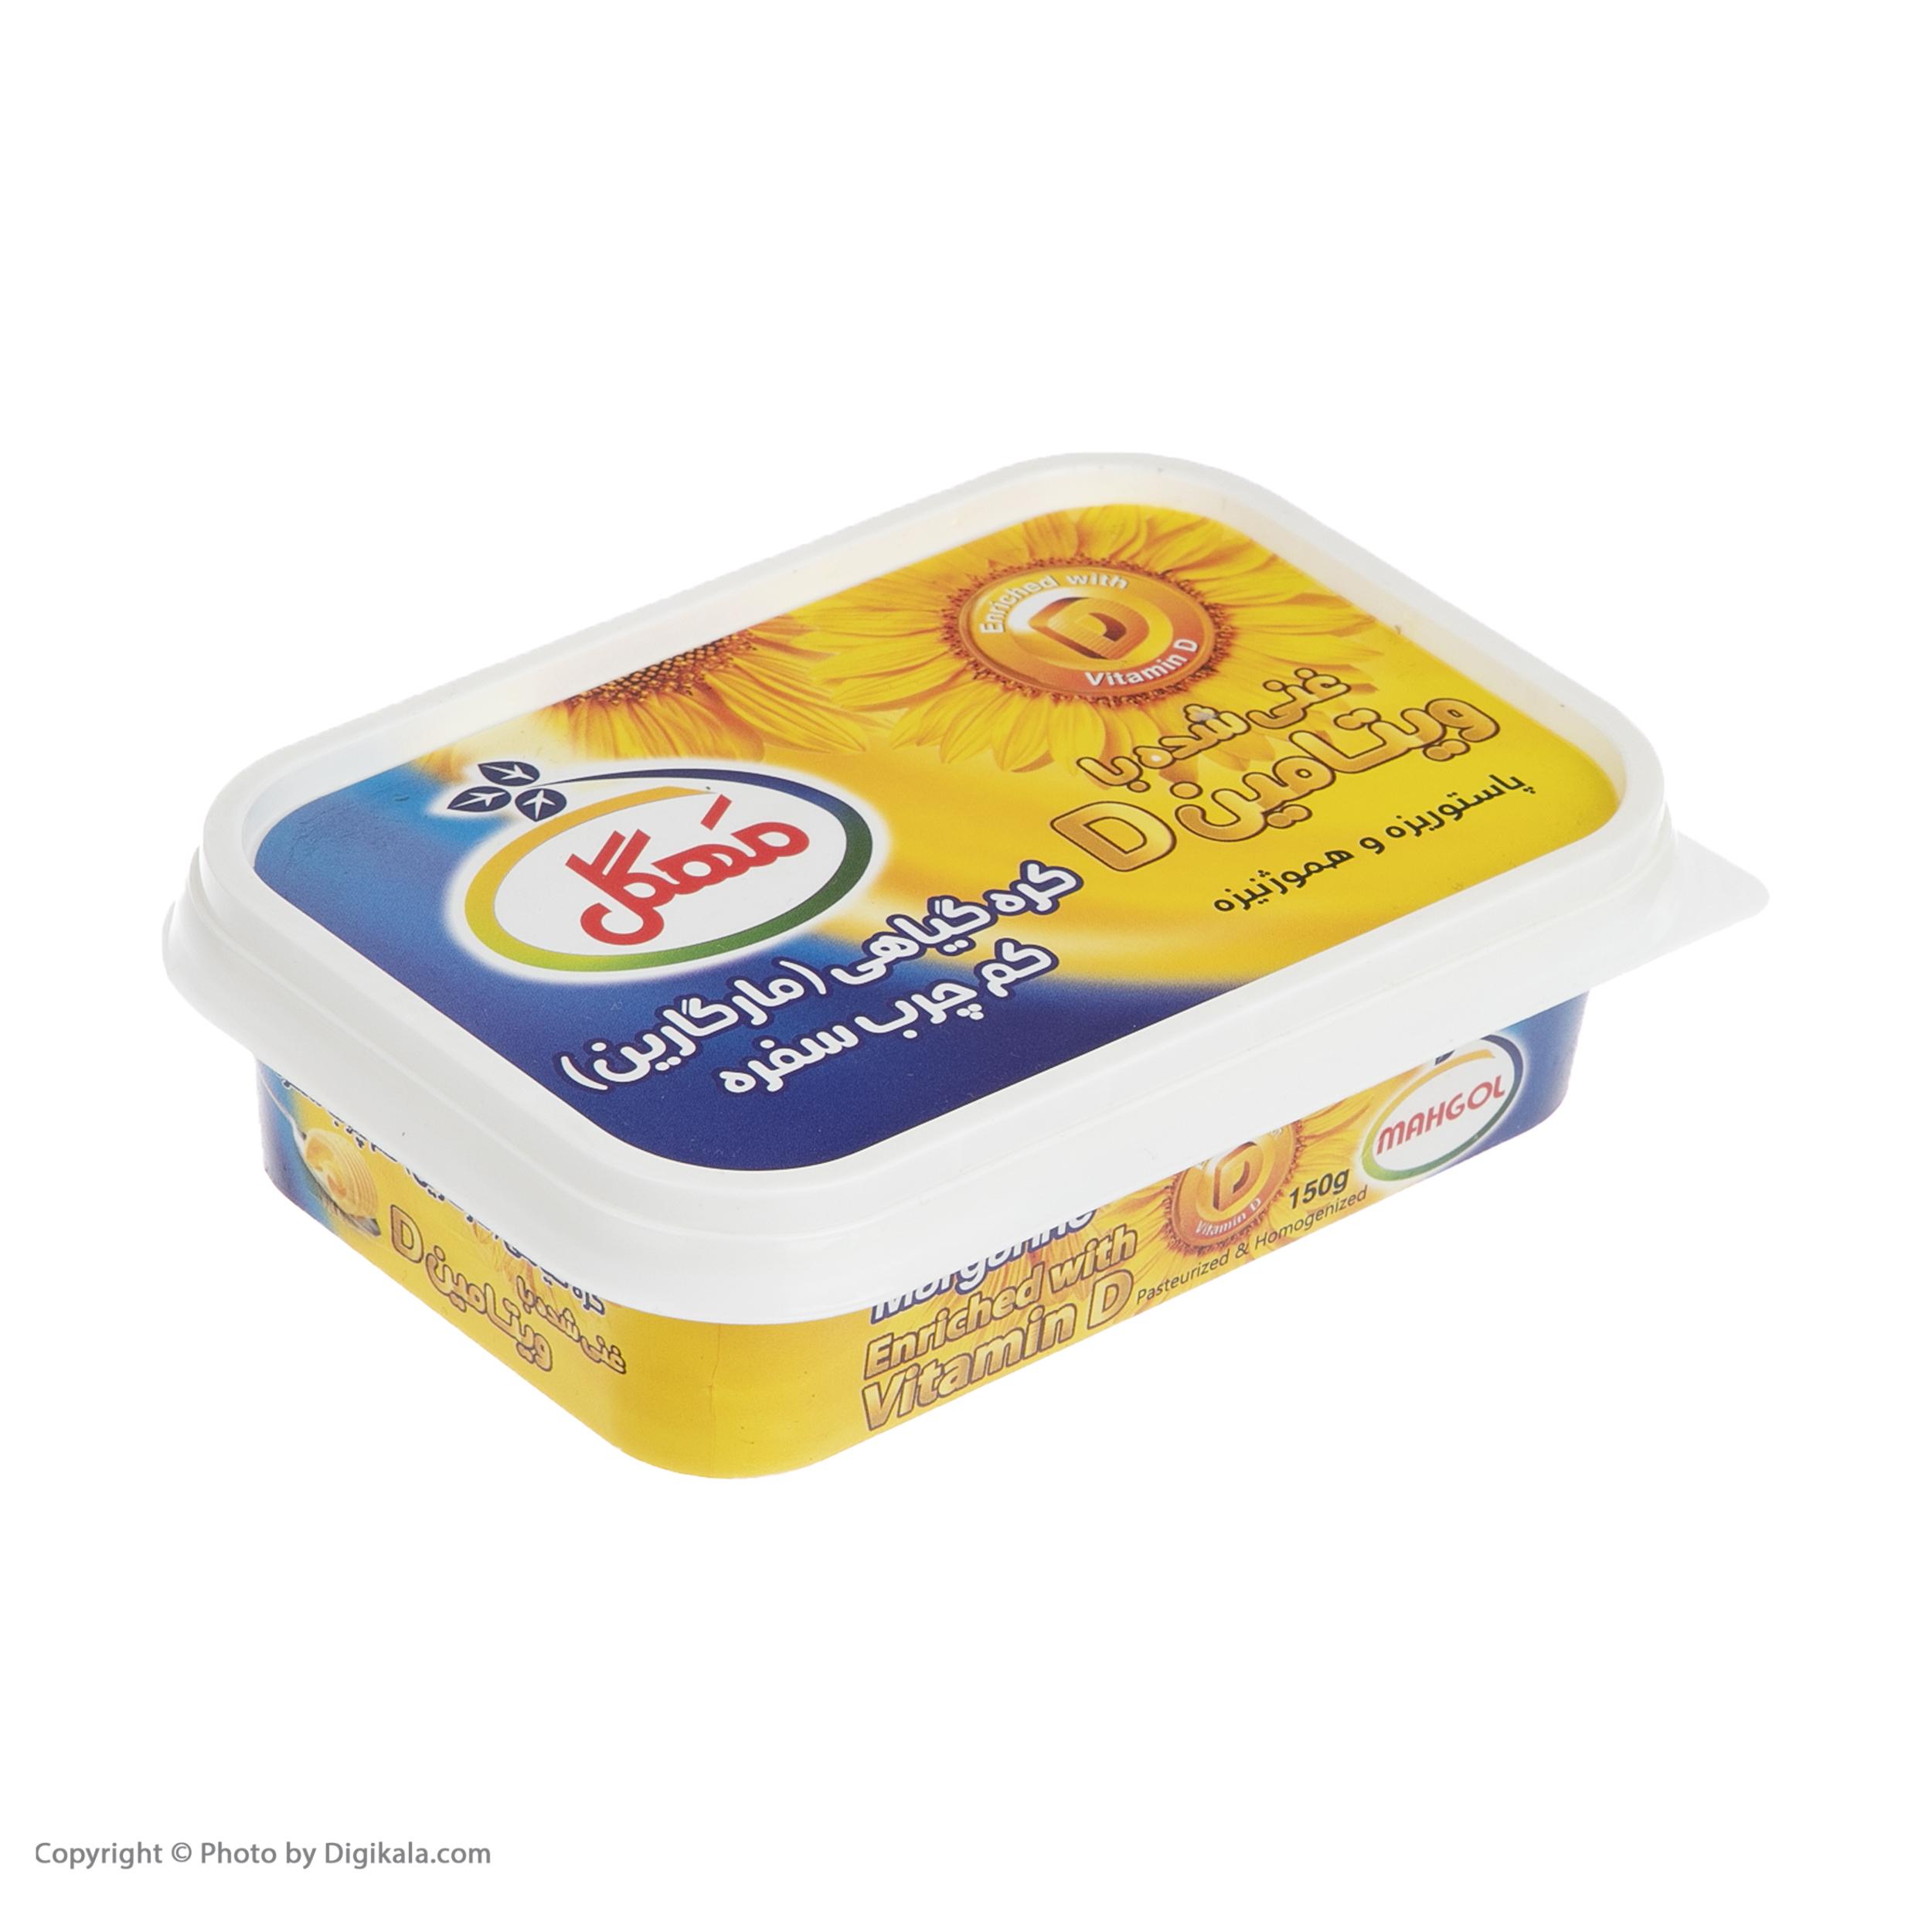 کره گیاهی مهگل - 150 گرم main 1 1